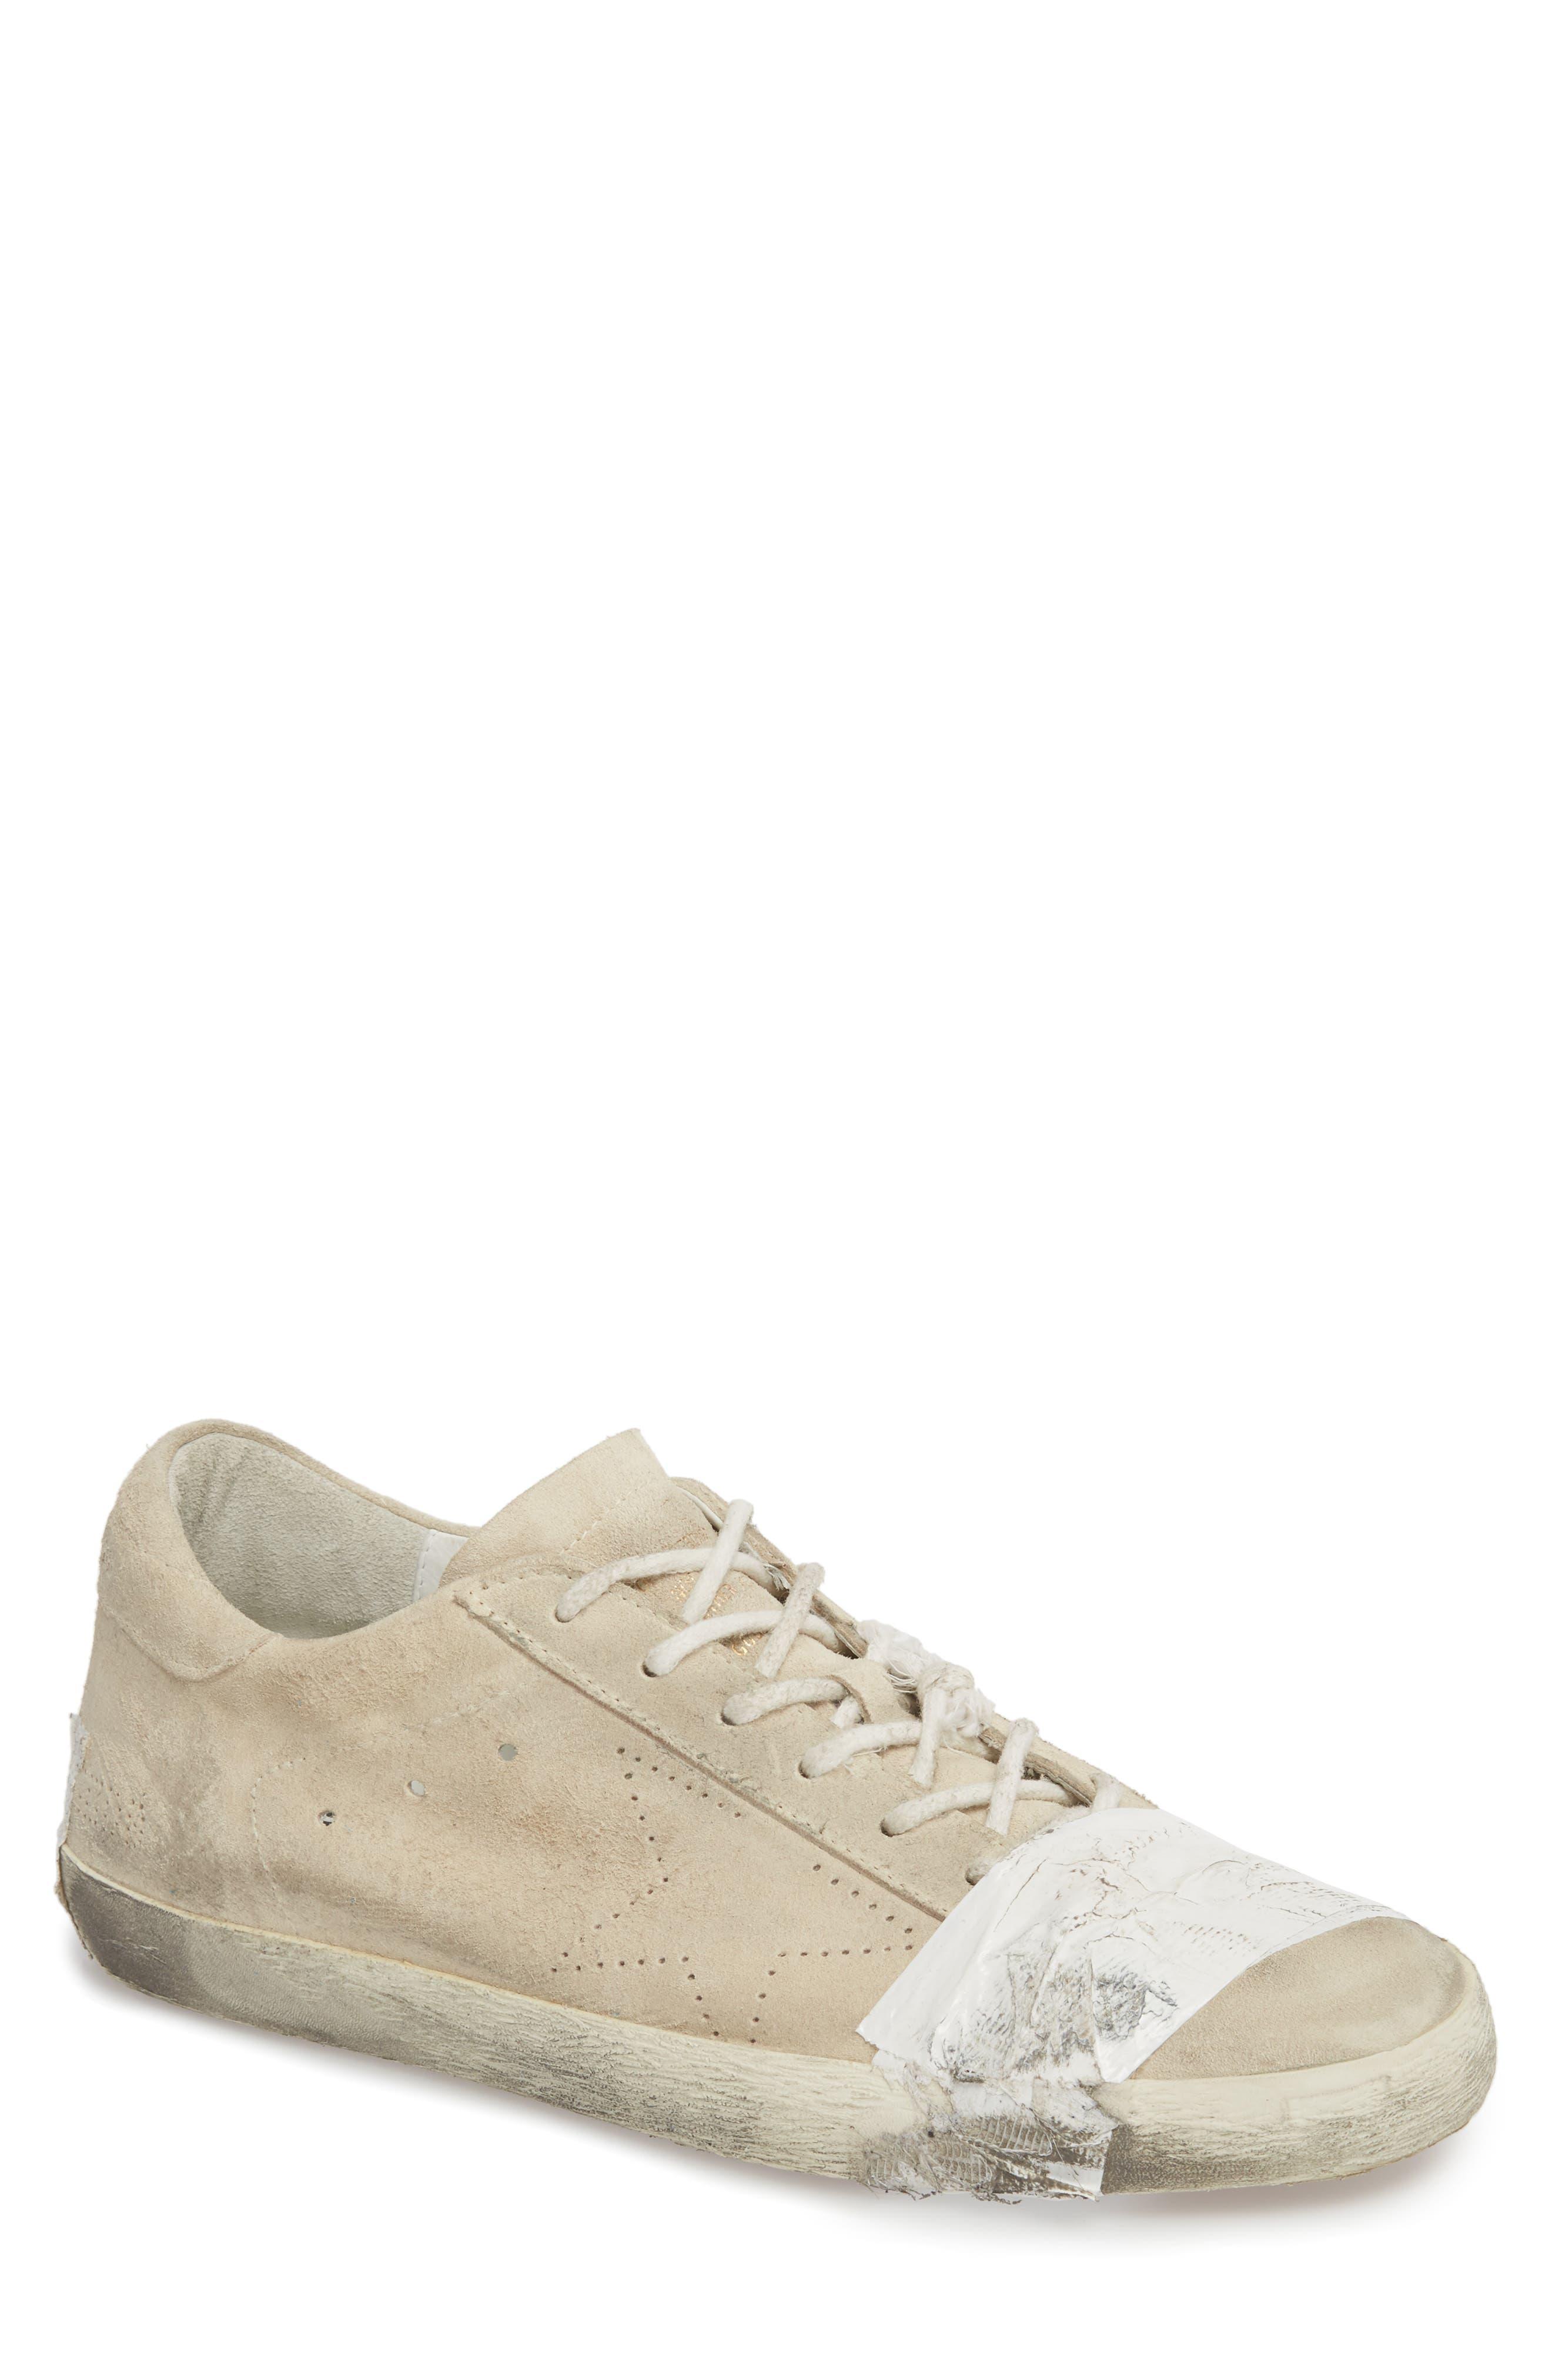 Golden Goose Superstar Taped Sneaker